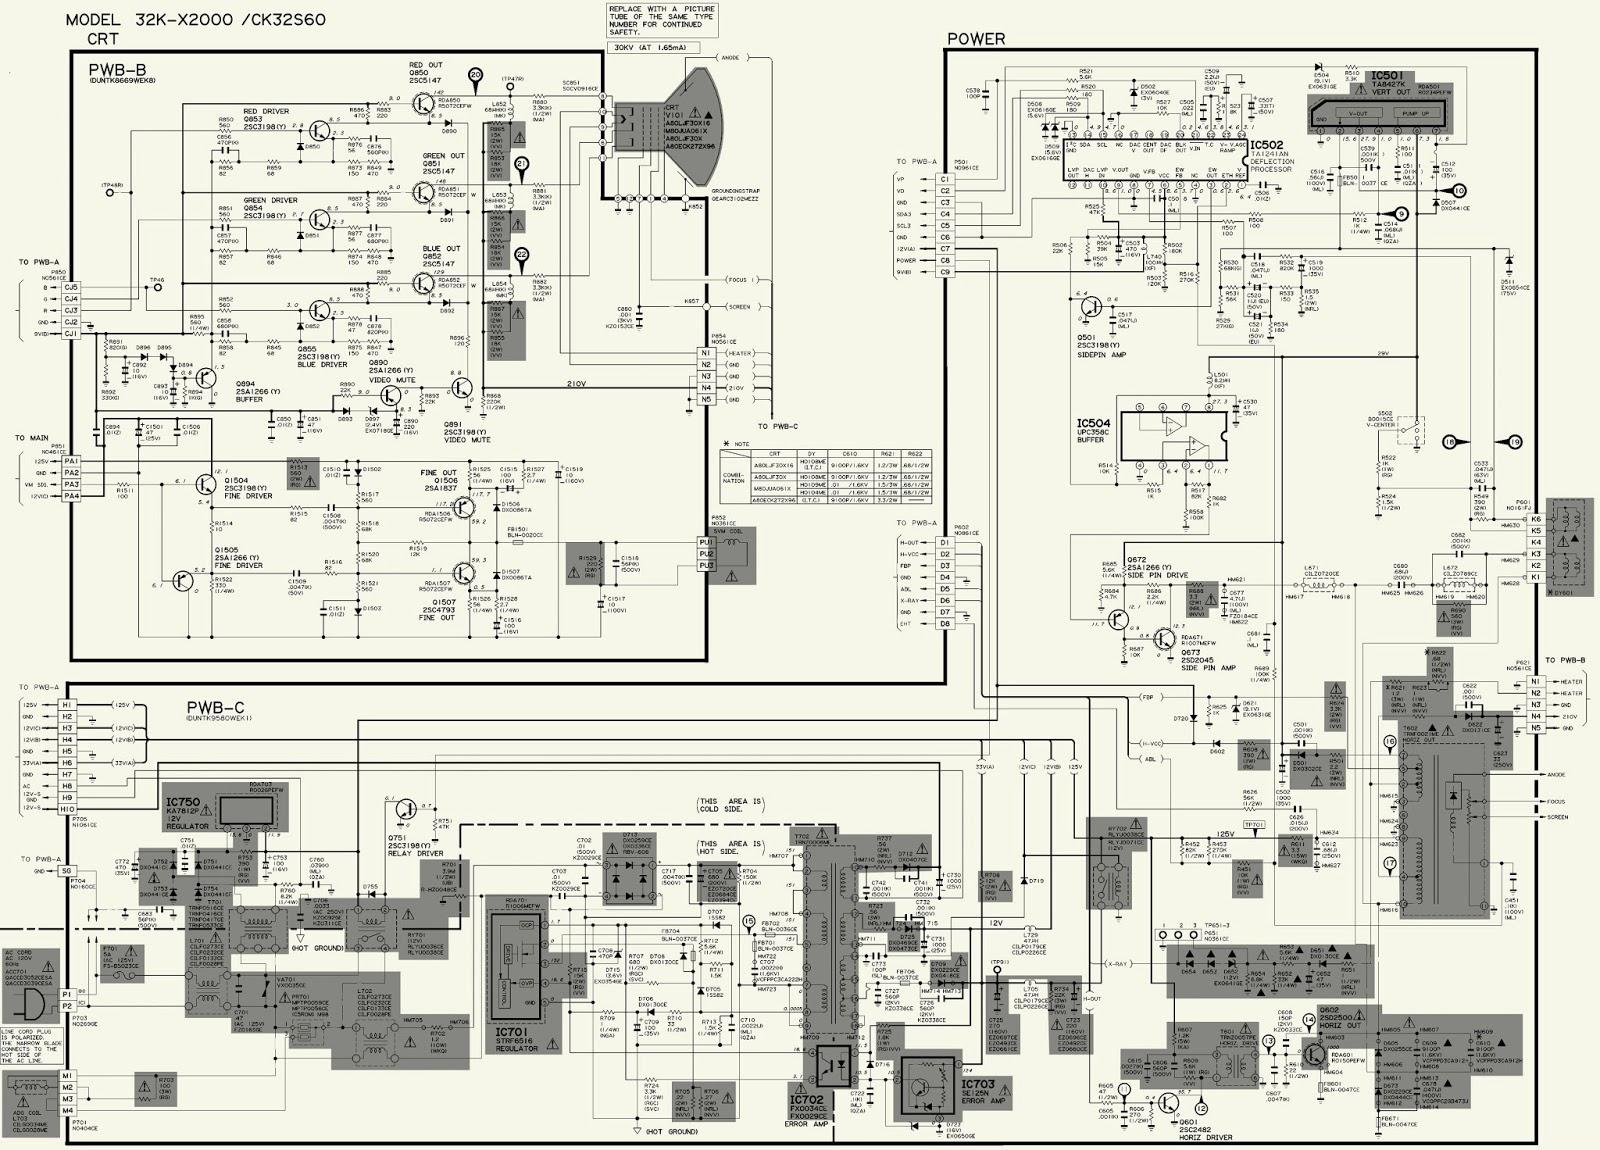 sharp schematic diagram  power and crt unit  36k-x2000  ck36s60   ck32s60